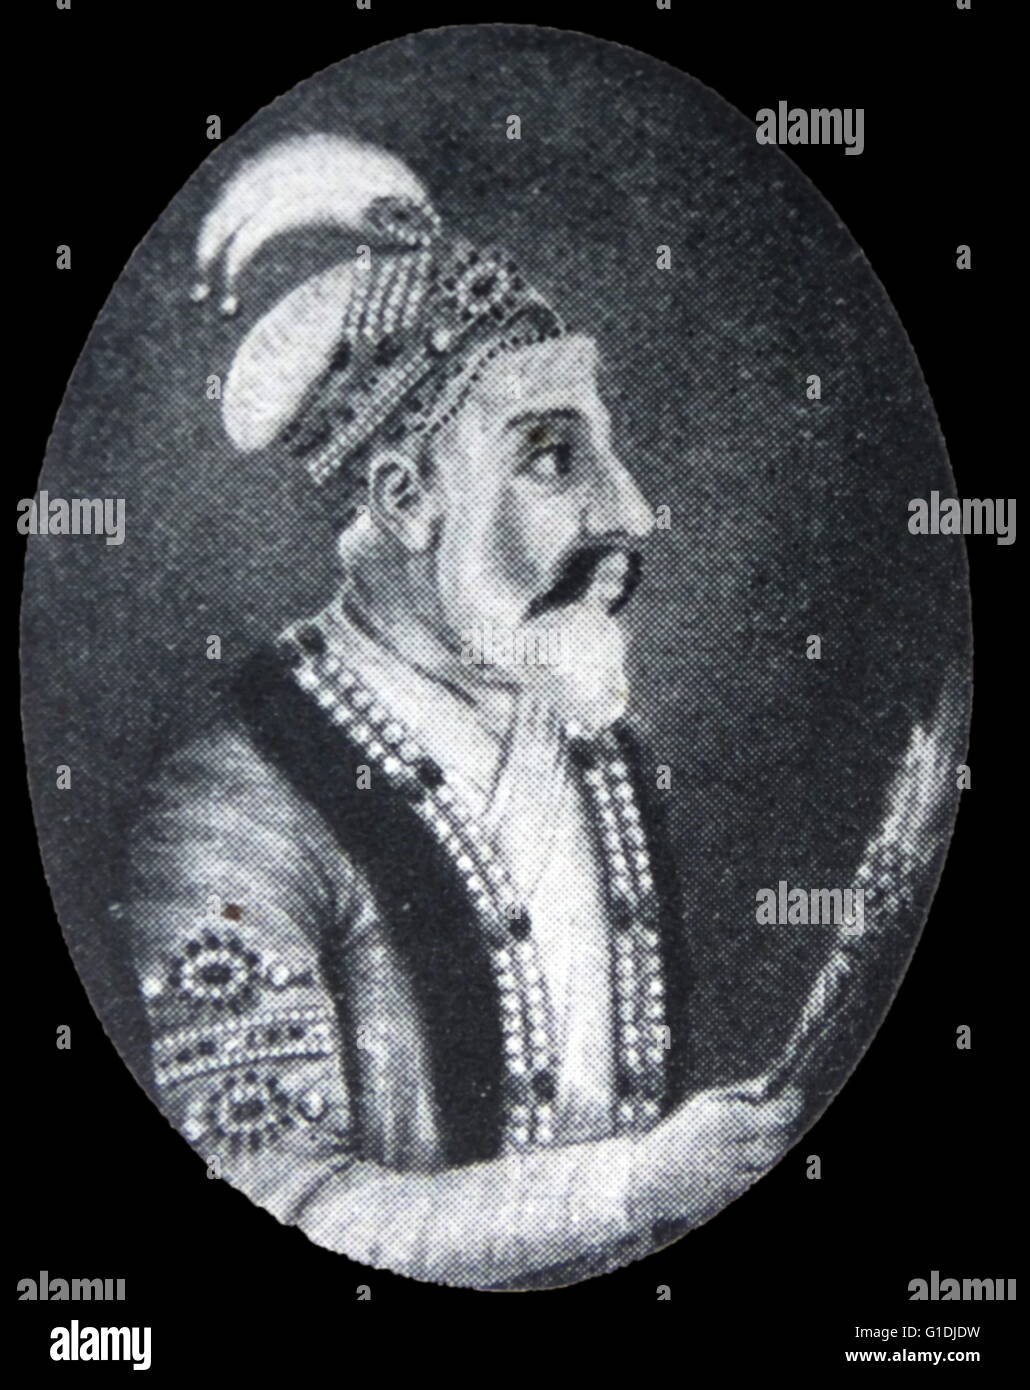 Shah Jahan 1592-1666. Mughal Emperor of India 1628-1658. - Stock Image